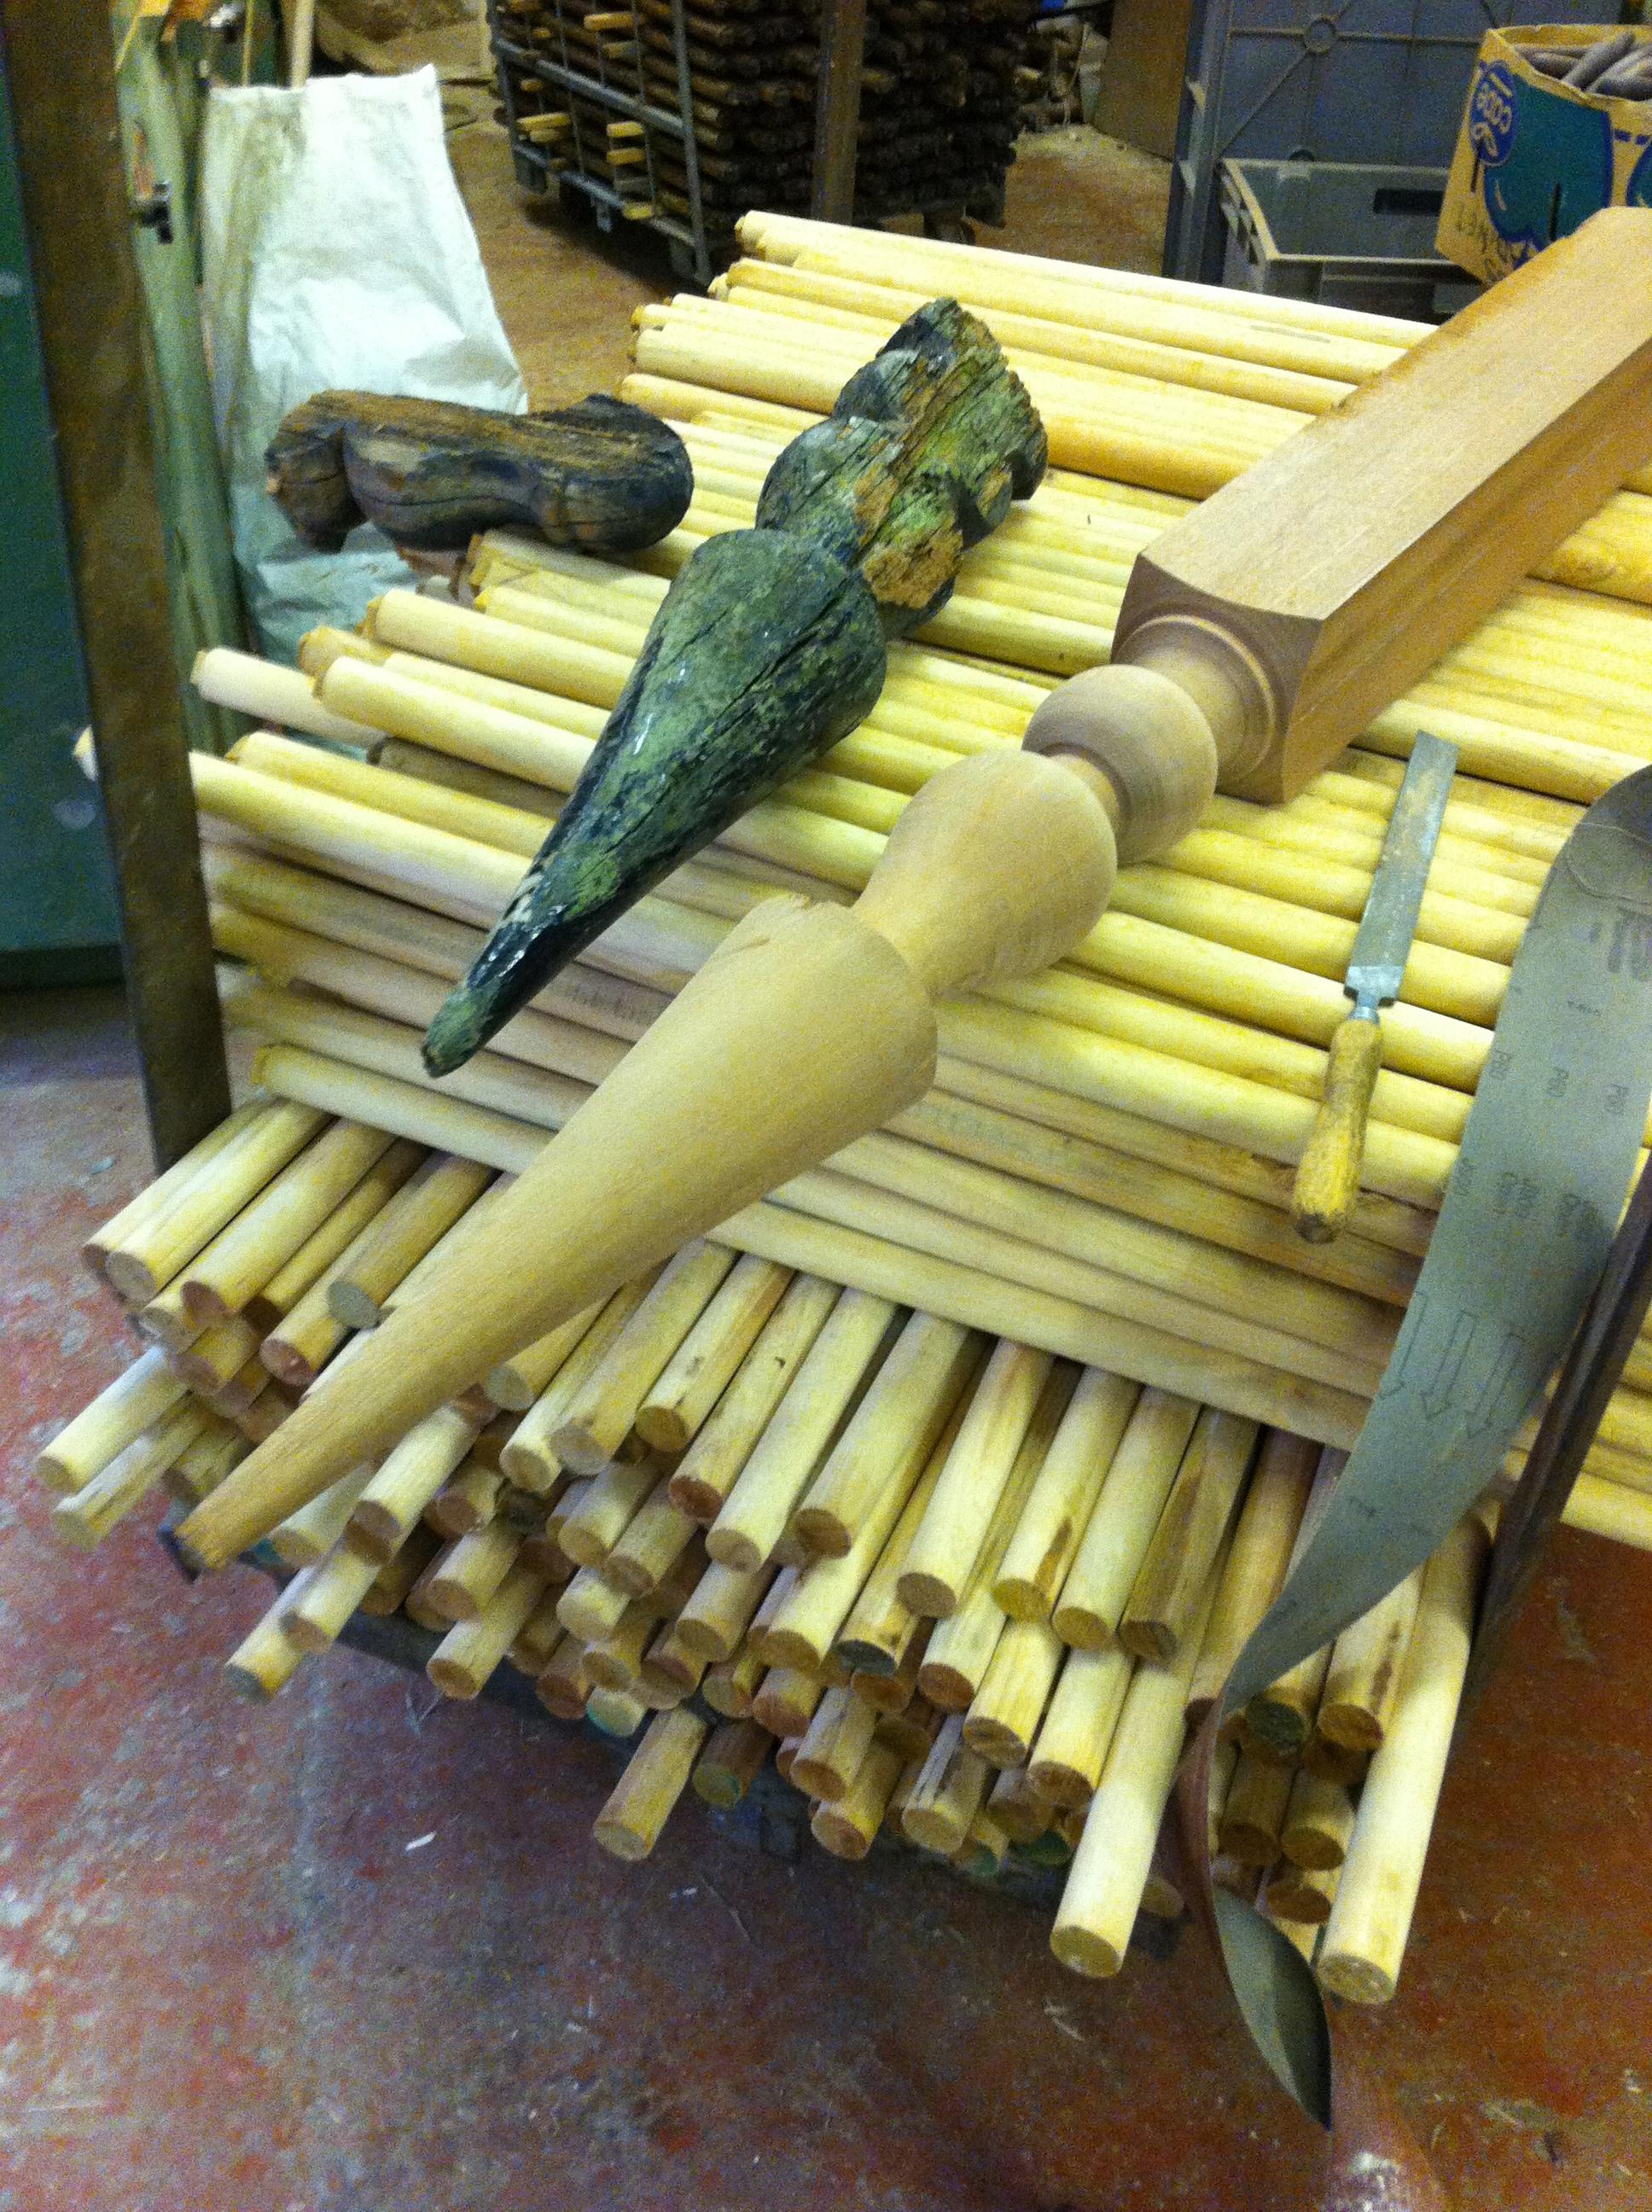 Bespoke Finial turned in hardwood